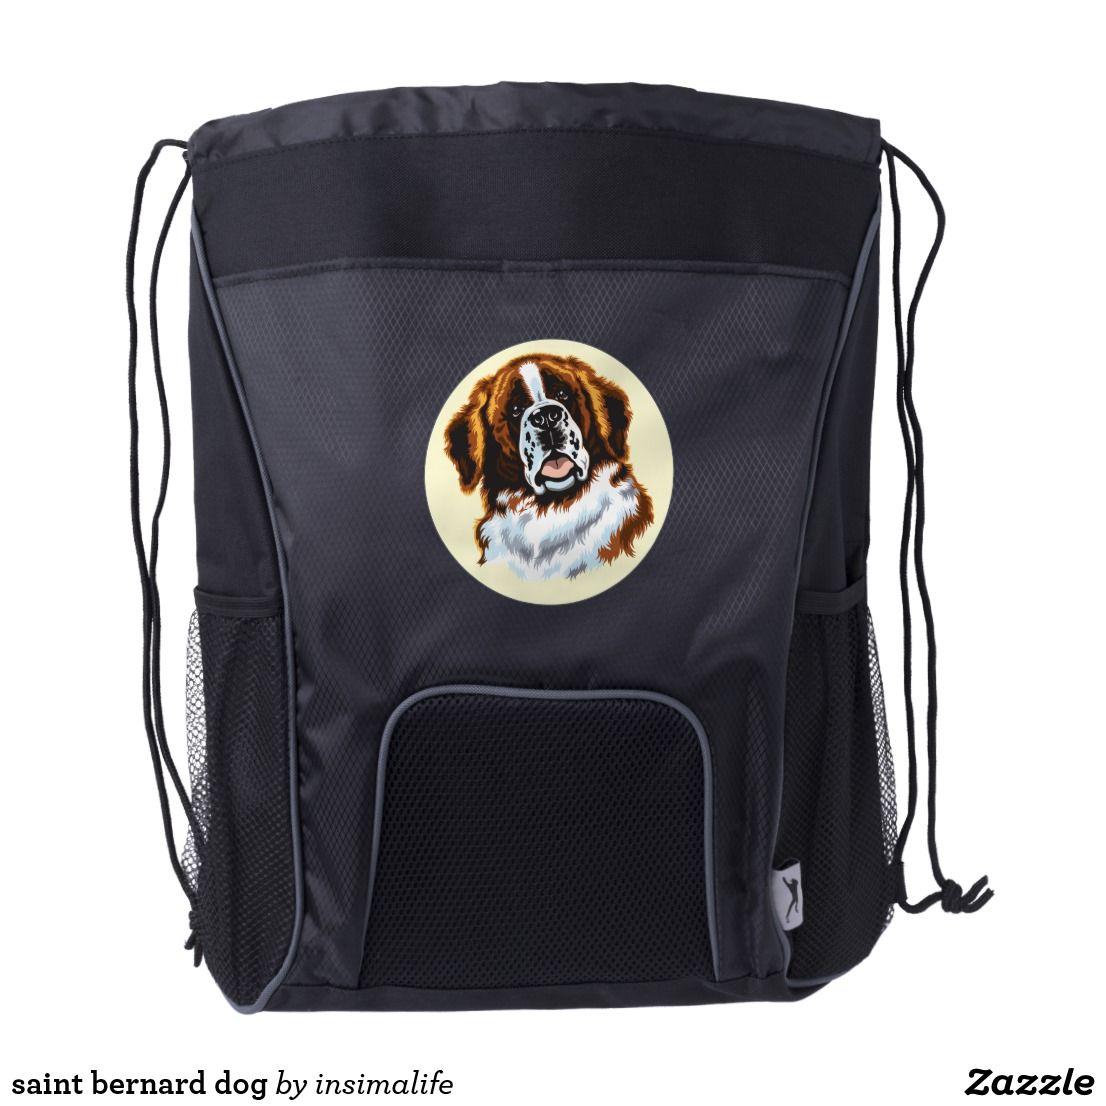 saint bernard dog drawstring backpack Drawstring